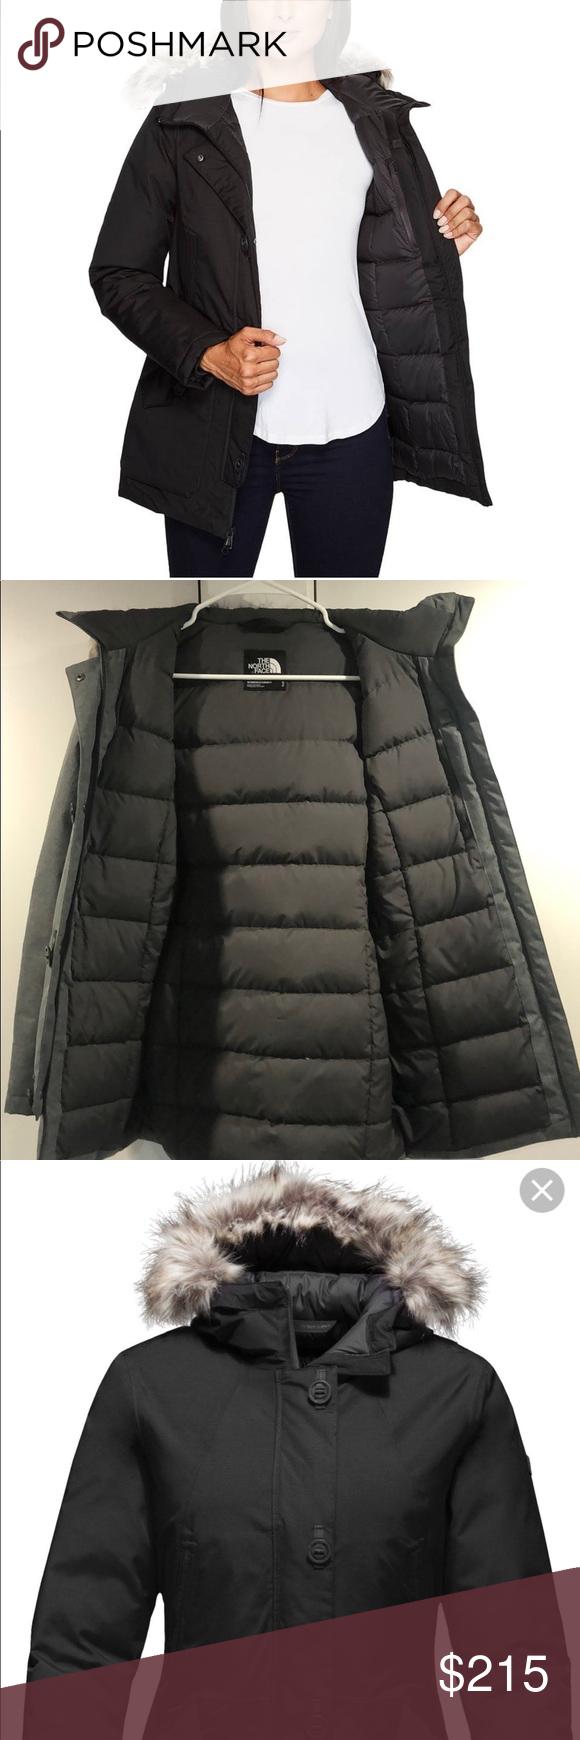 The North Face Parka Waterproof Coat In Gray North Face Parka Waterproof Coat Women Winter Coat Warmest [ 1740 x 580 Pixel ]